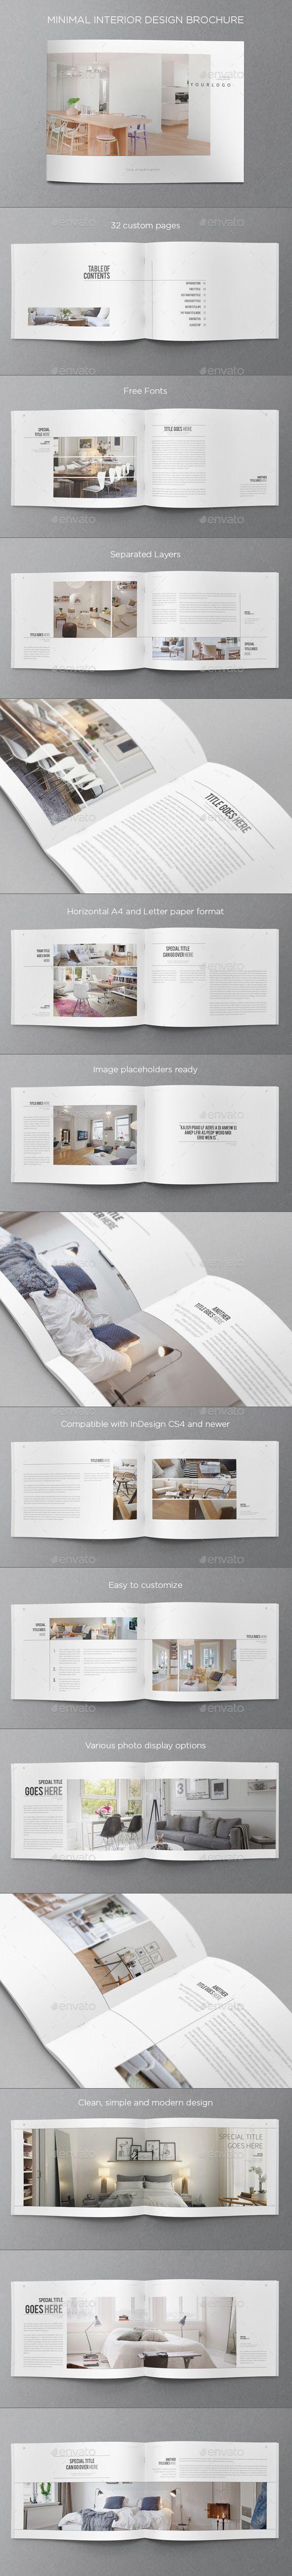 Minimal Interior Design Brochure. Download here: graphicriver.net/... #design #brochure